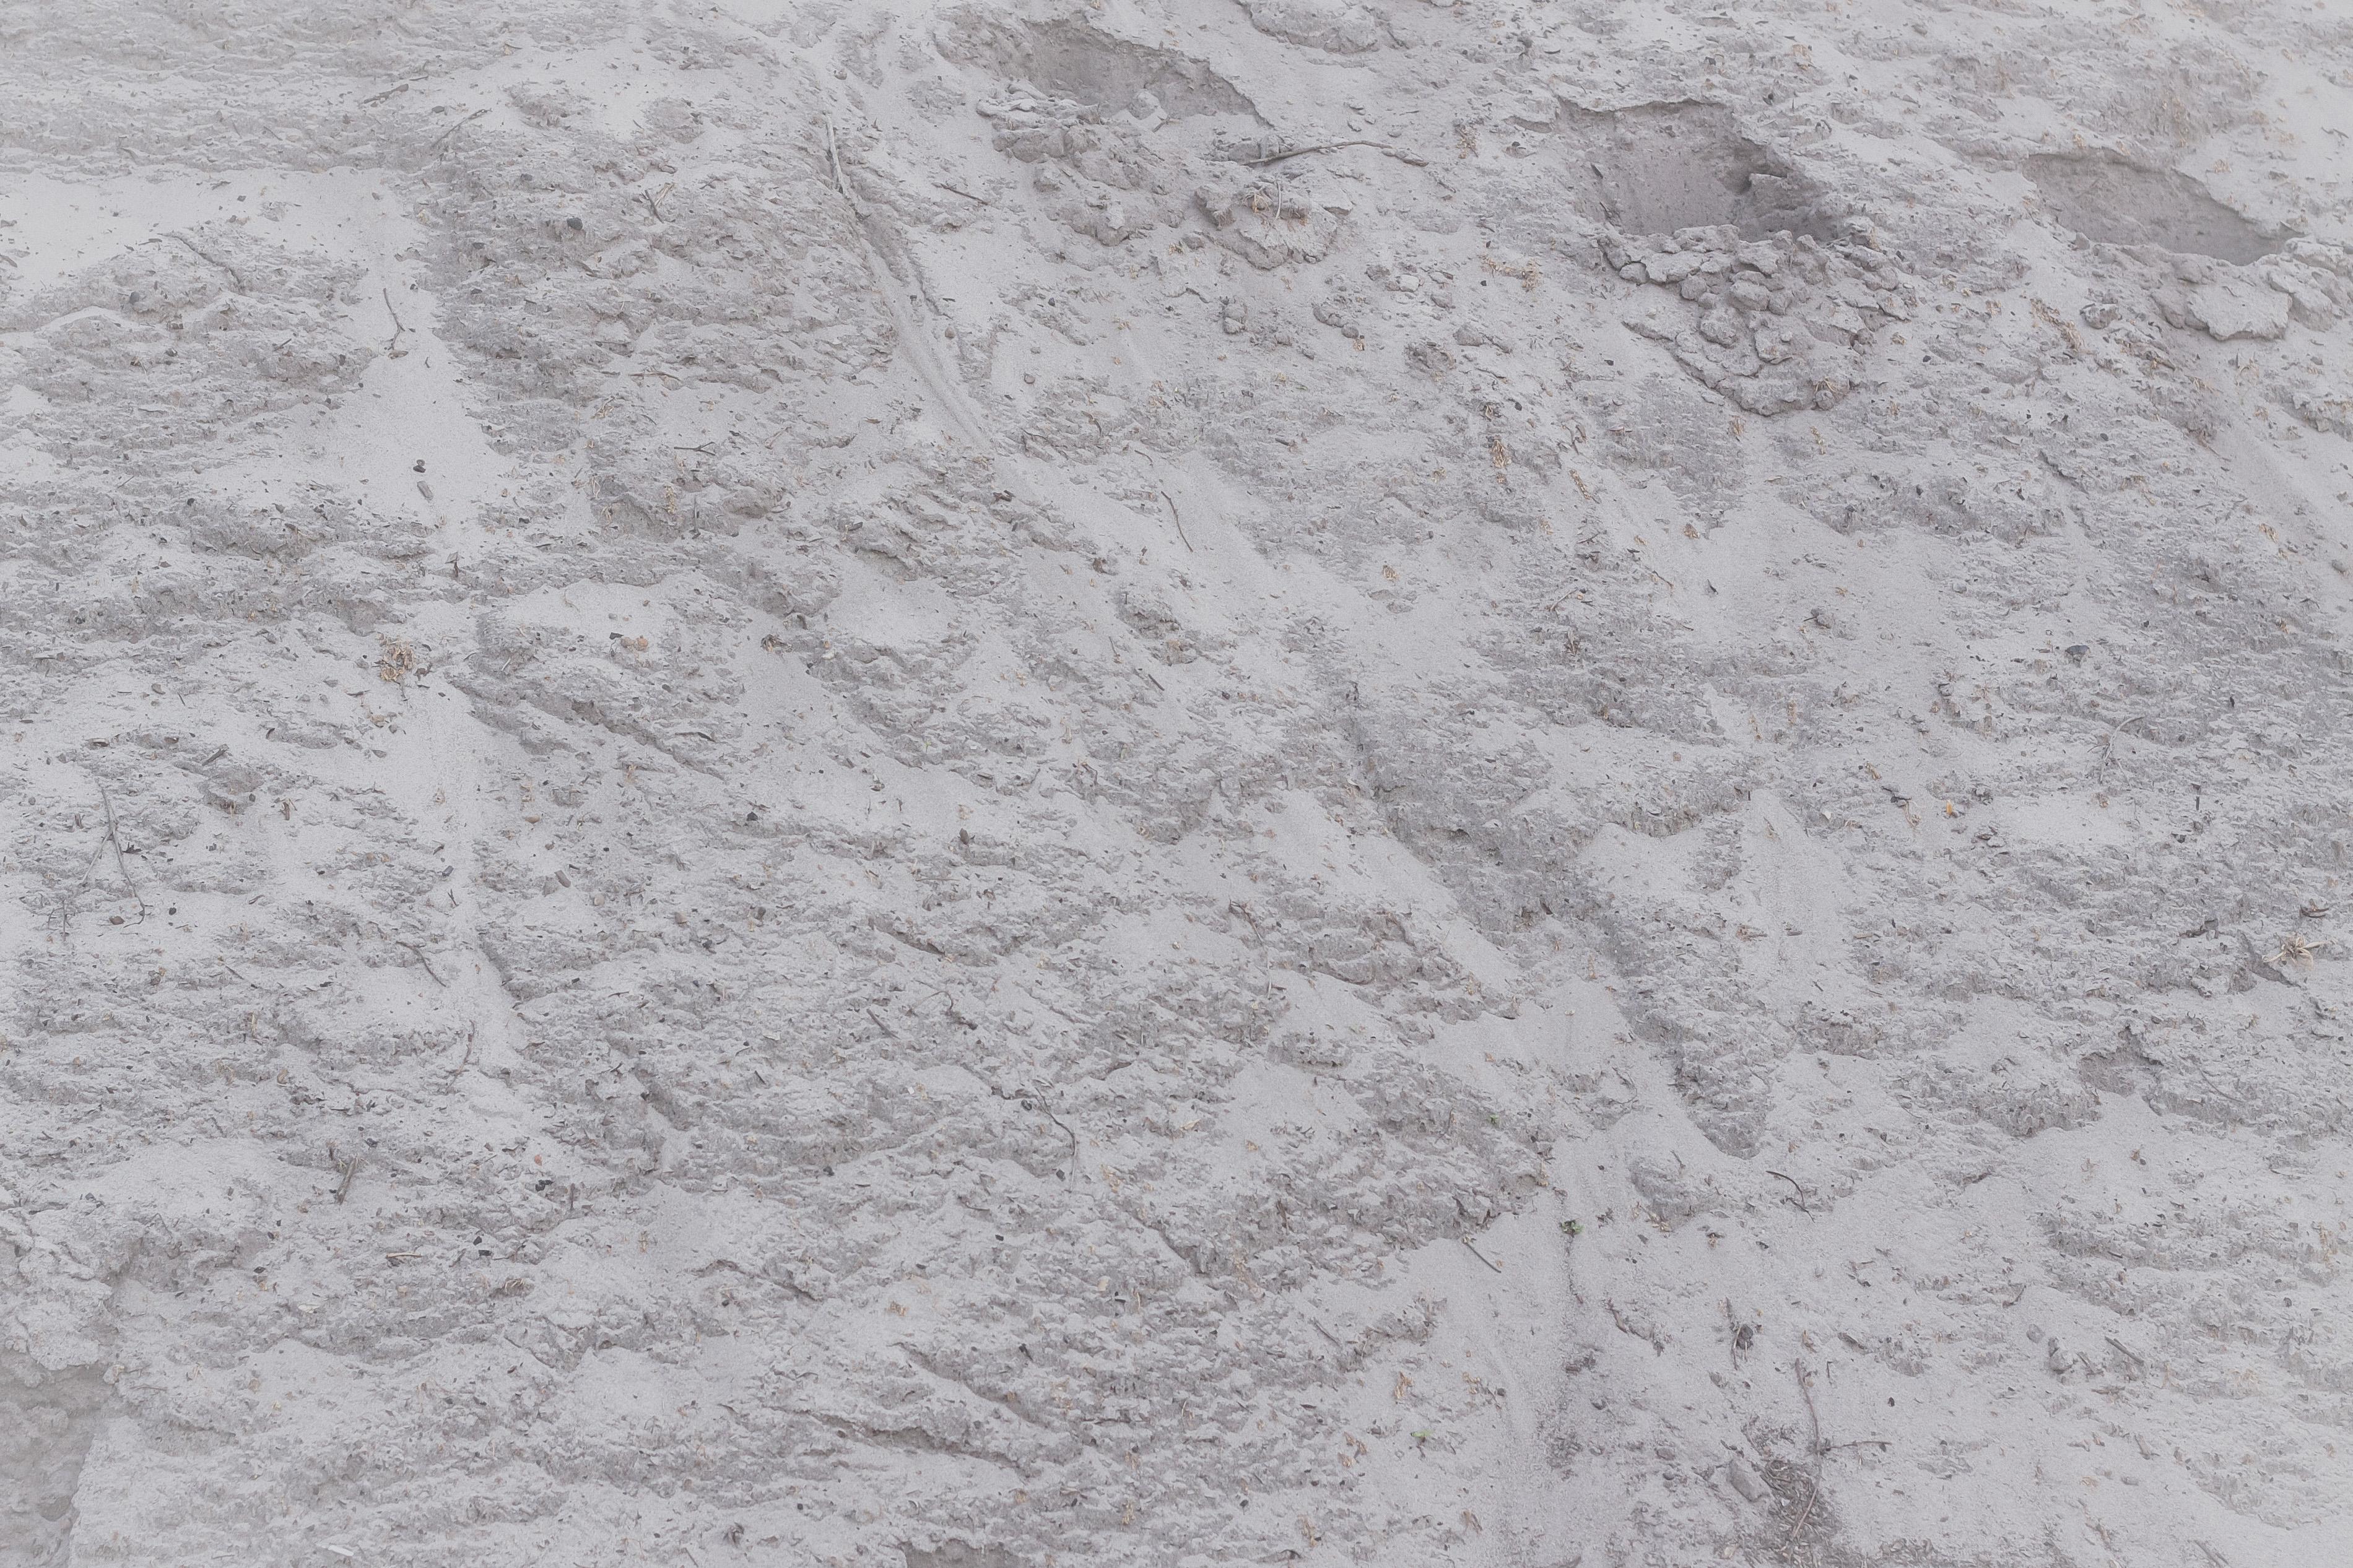 White Sand closeup Landscape Supply Photography